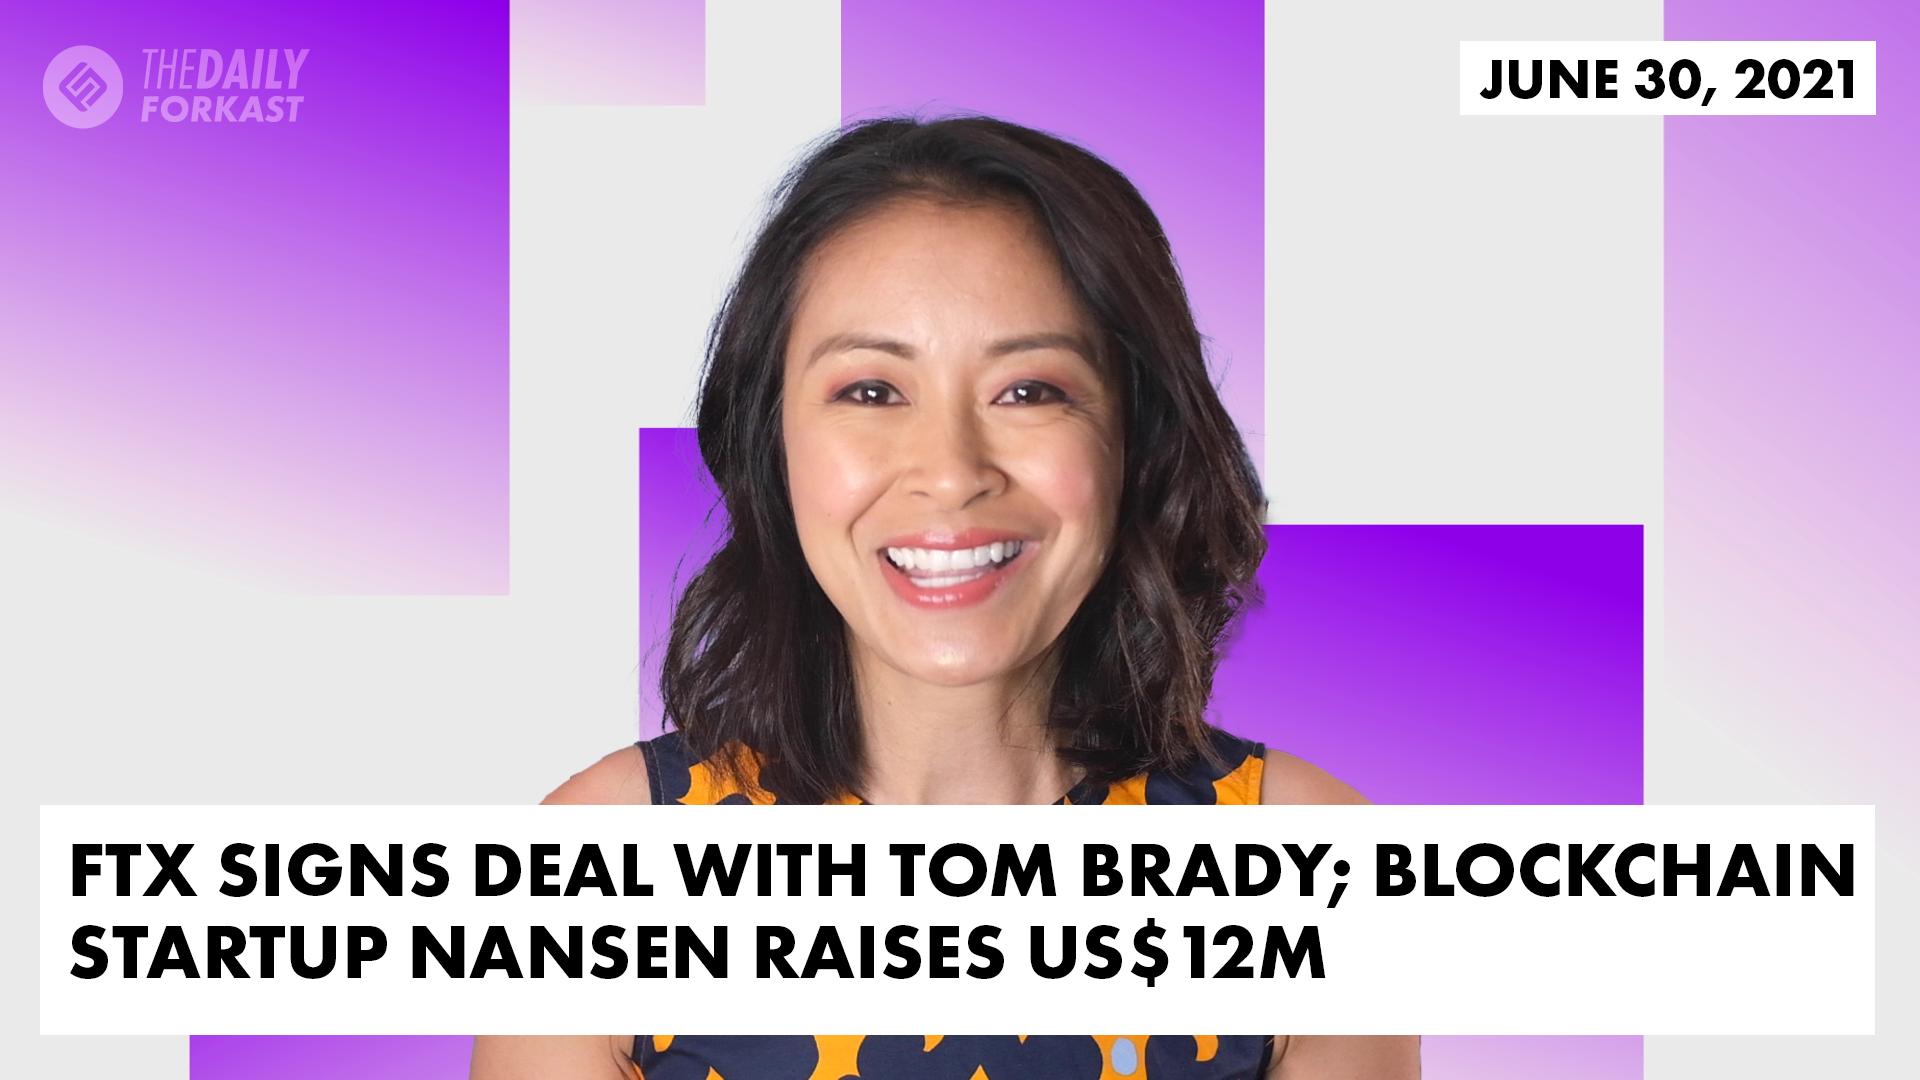 FTX firma un acuerdo con Tom Brady;  La startup blockchain Nansen recauda US $ 12 millones